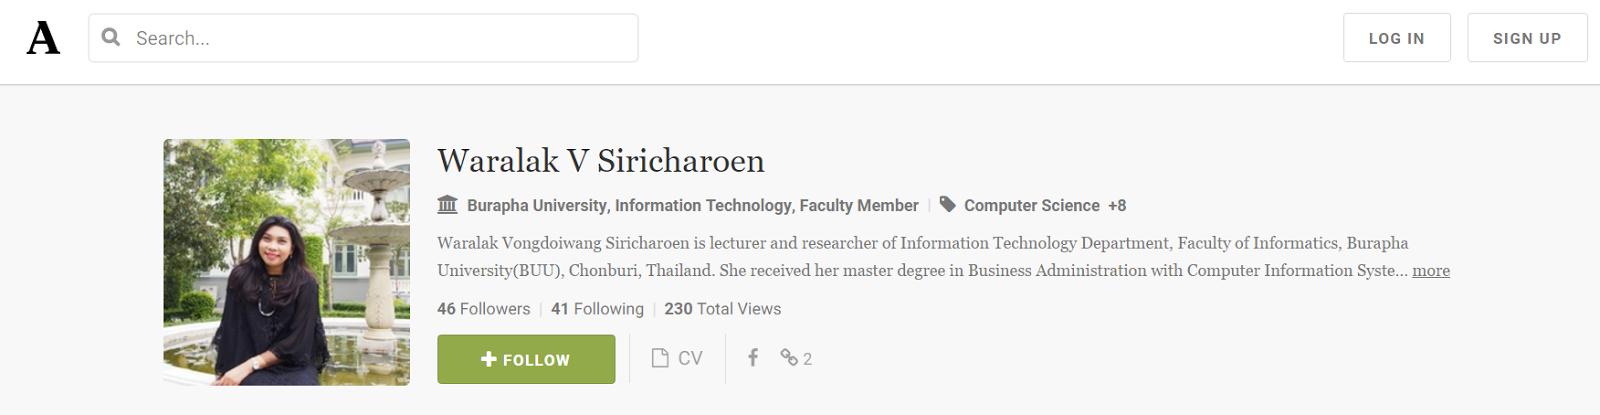 Waralak V. Siricharoen Academia.edu